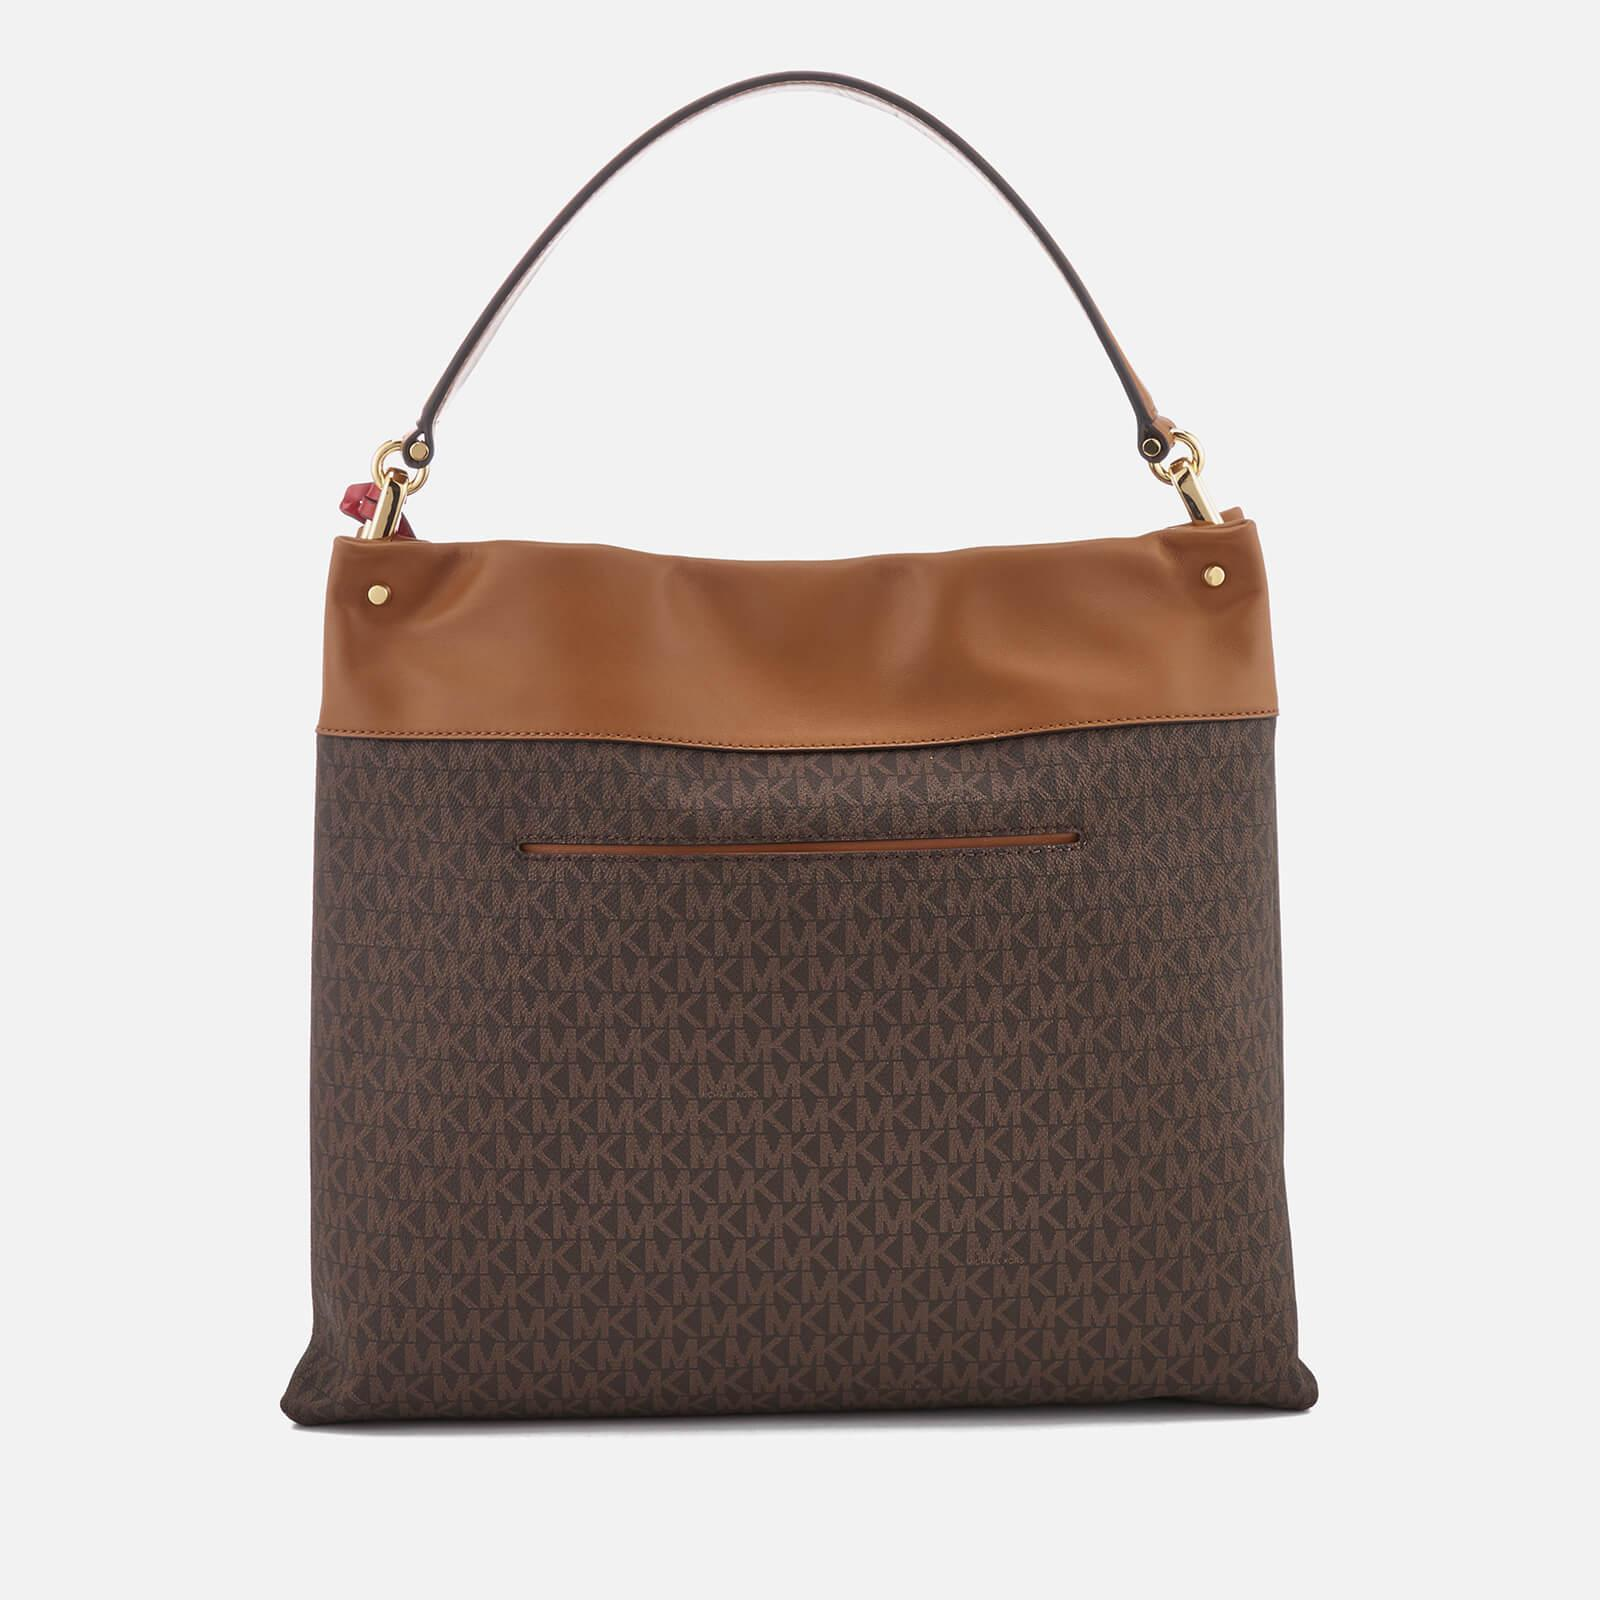 e7532a94369c MICHAEL Michael Kors Lex Large Hobo Bag in Brown - Lyst